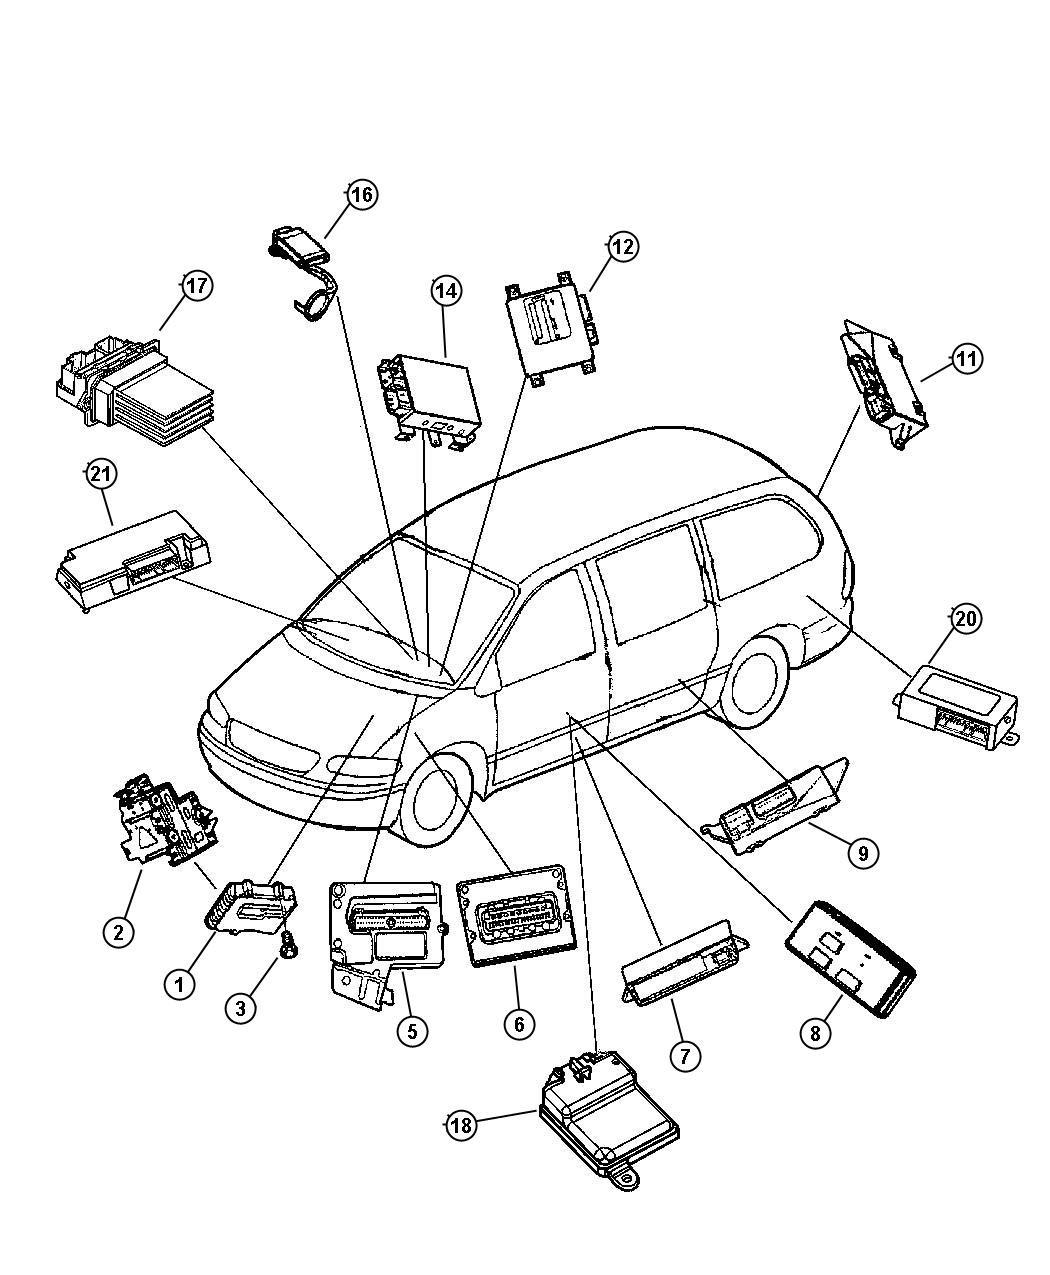 Diagram 2003 Dodge Caravan Parts Diagram Full Version Hd Quality Parts Diagram Anawiringx18 Locandadossello It